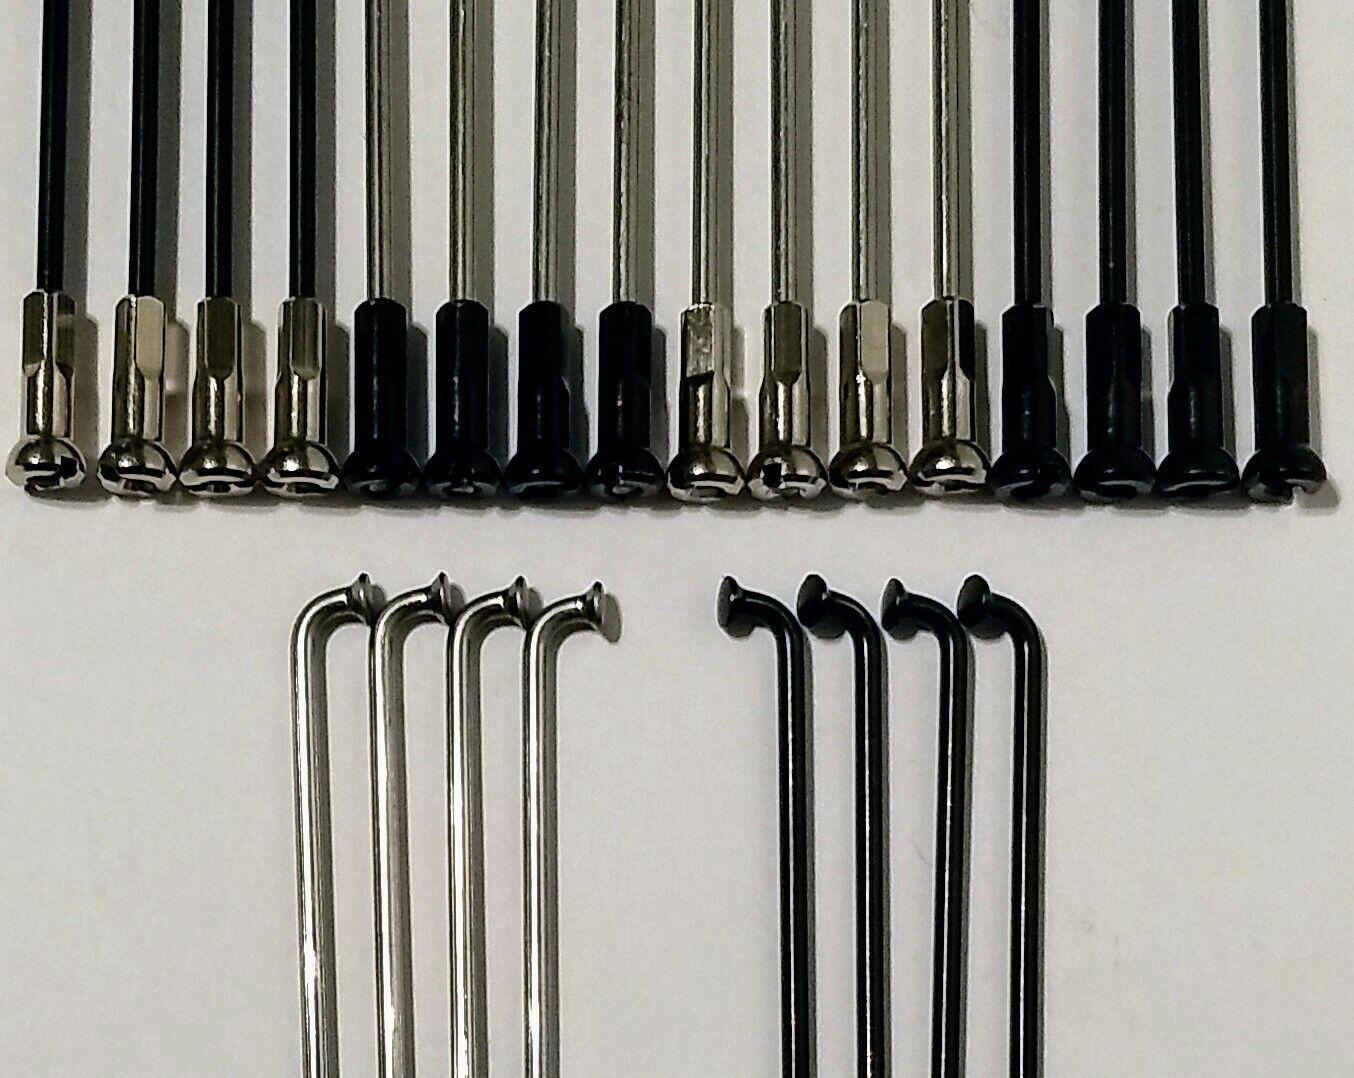 "New MTB Road BMX Bicycle Bike Brass Spoke Nipples 2.0mm 14G 1//2/"" 72 Pcs Black"